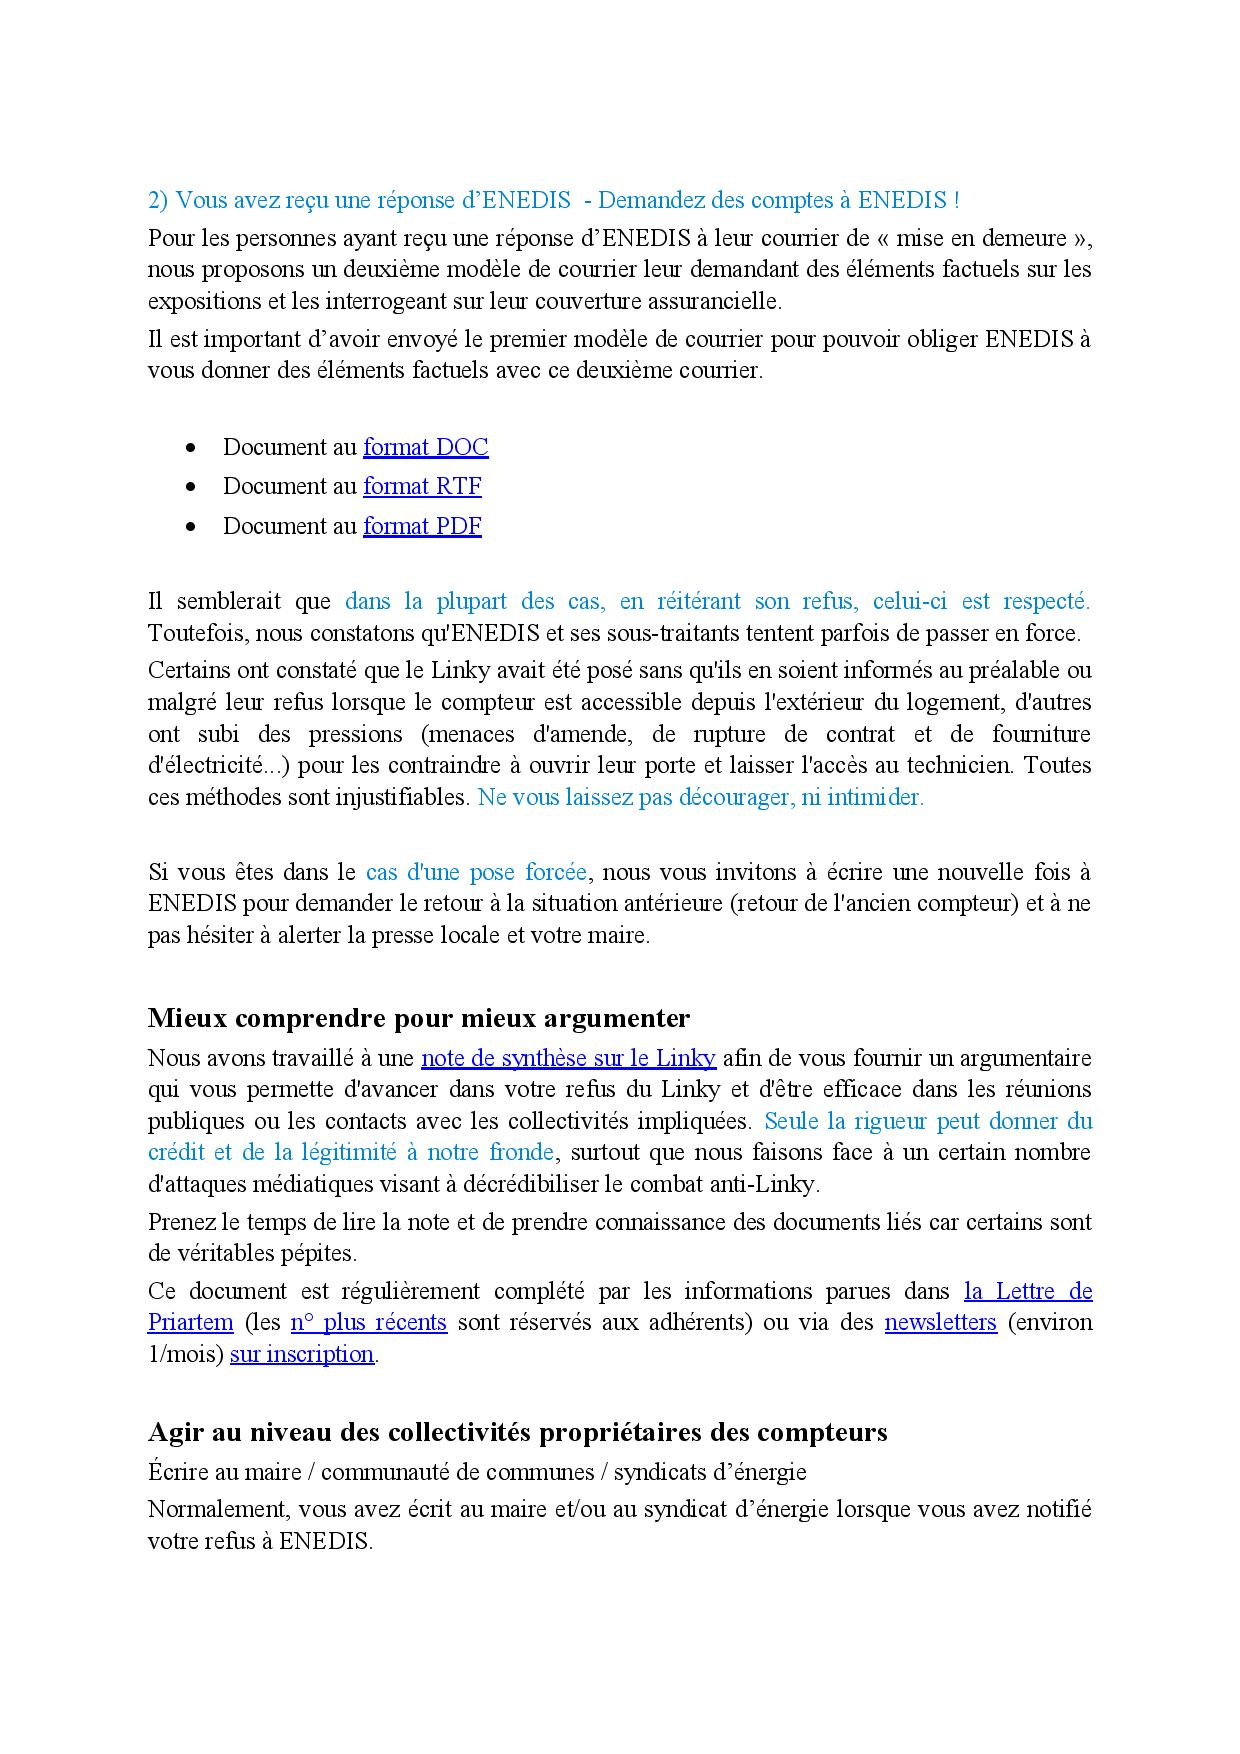 18-2 Priartem linky_-_agir-page-002.jpg